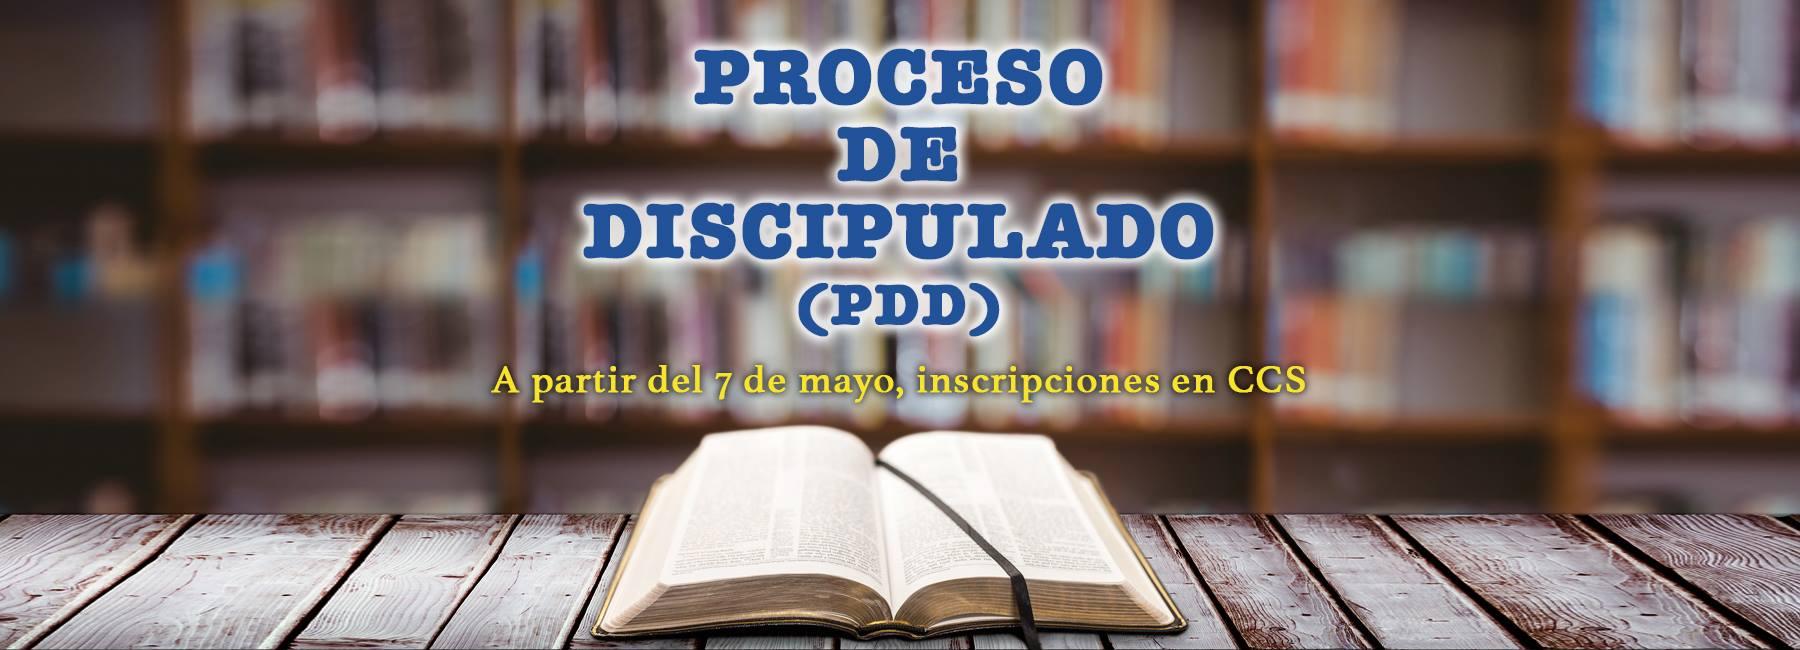 PROCESO DE DISCIPULADO (PDD)